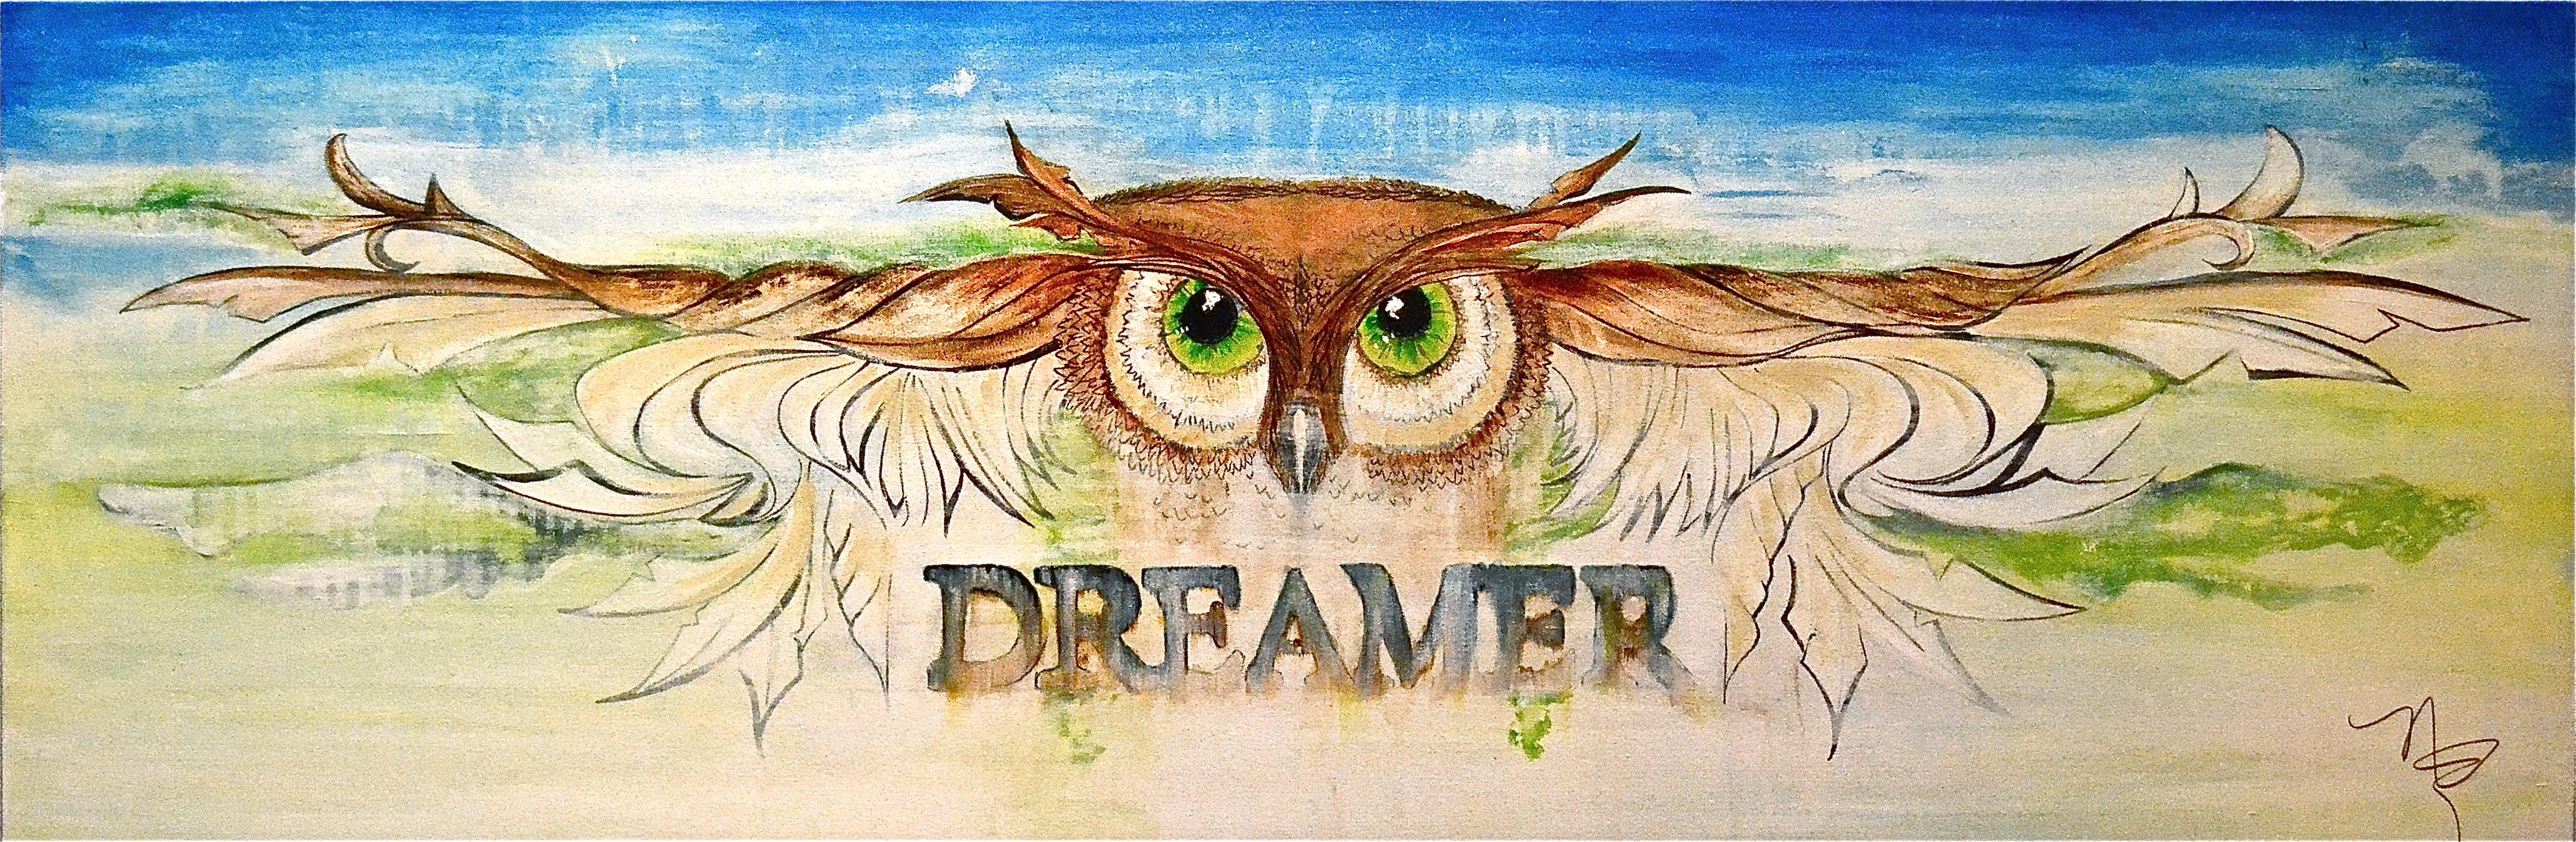 DREAMER_NGalloway